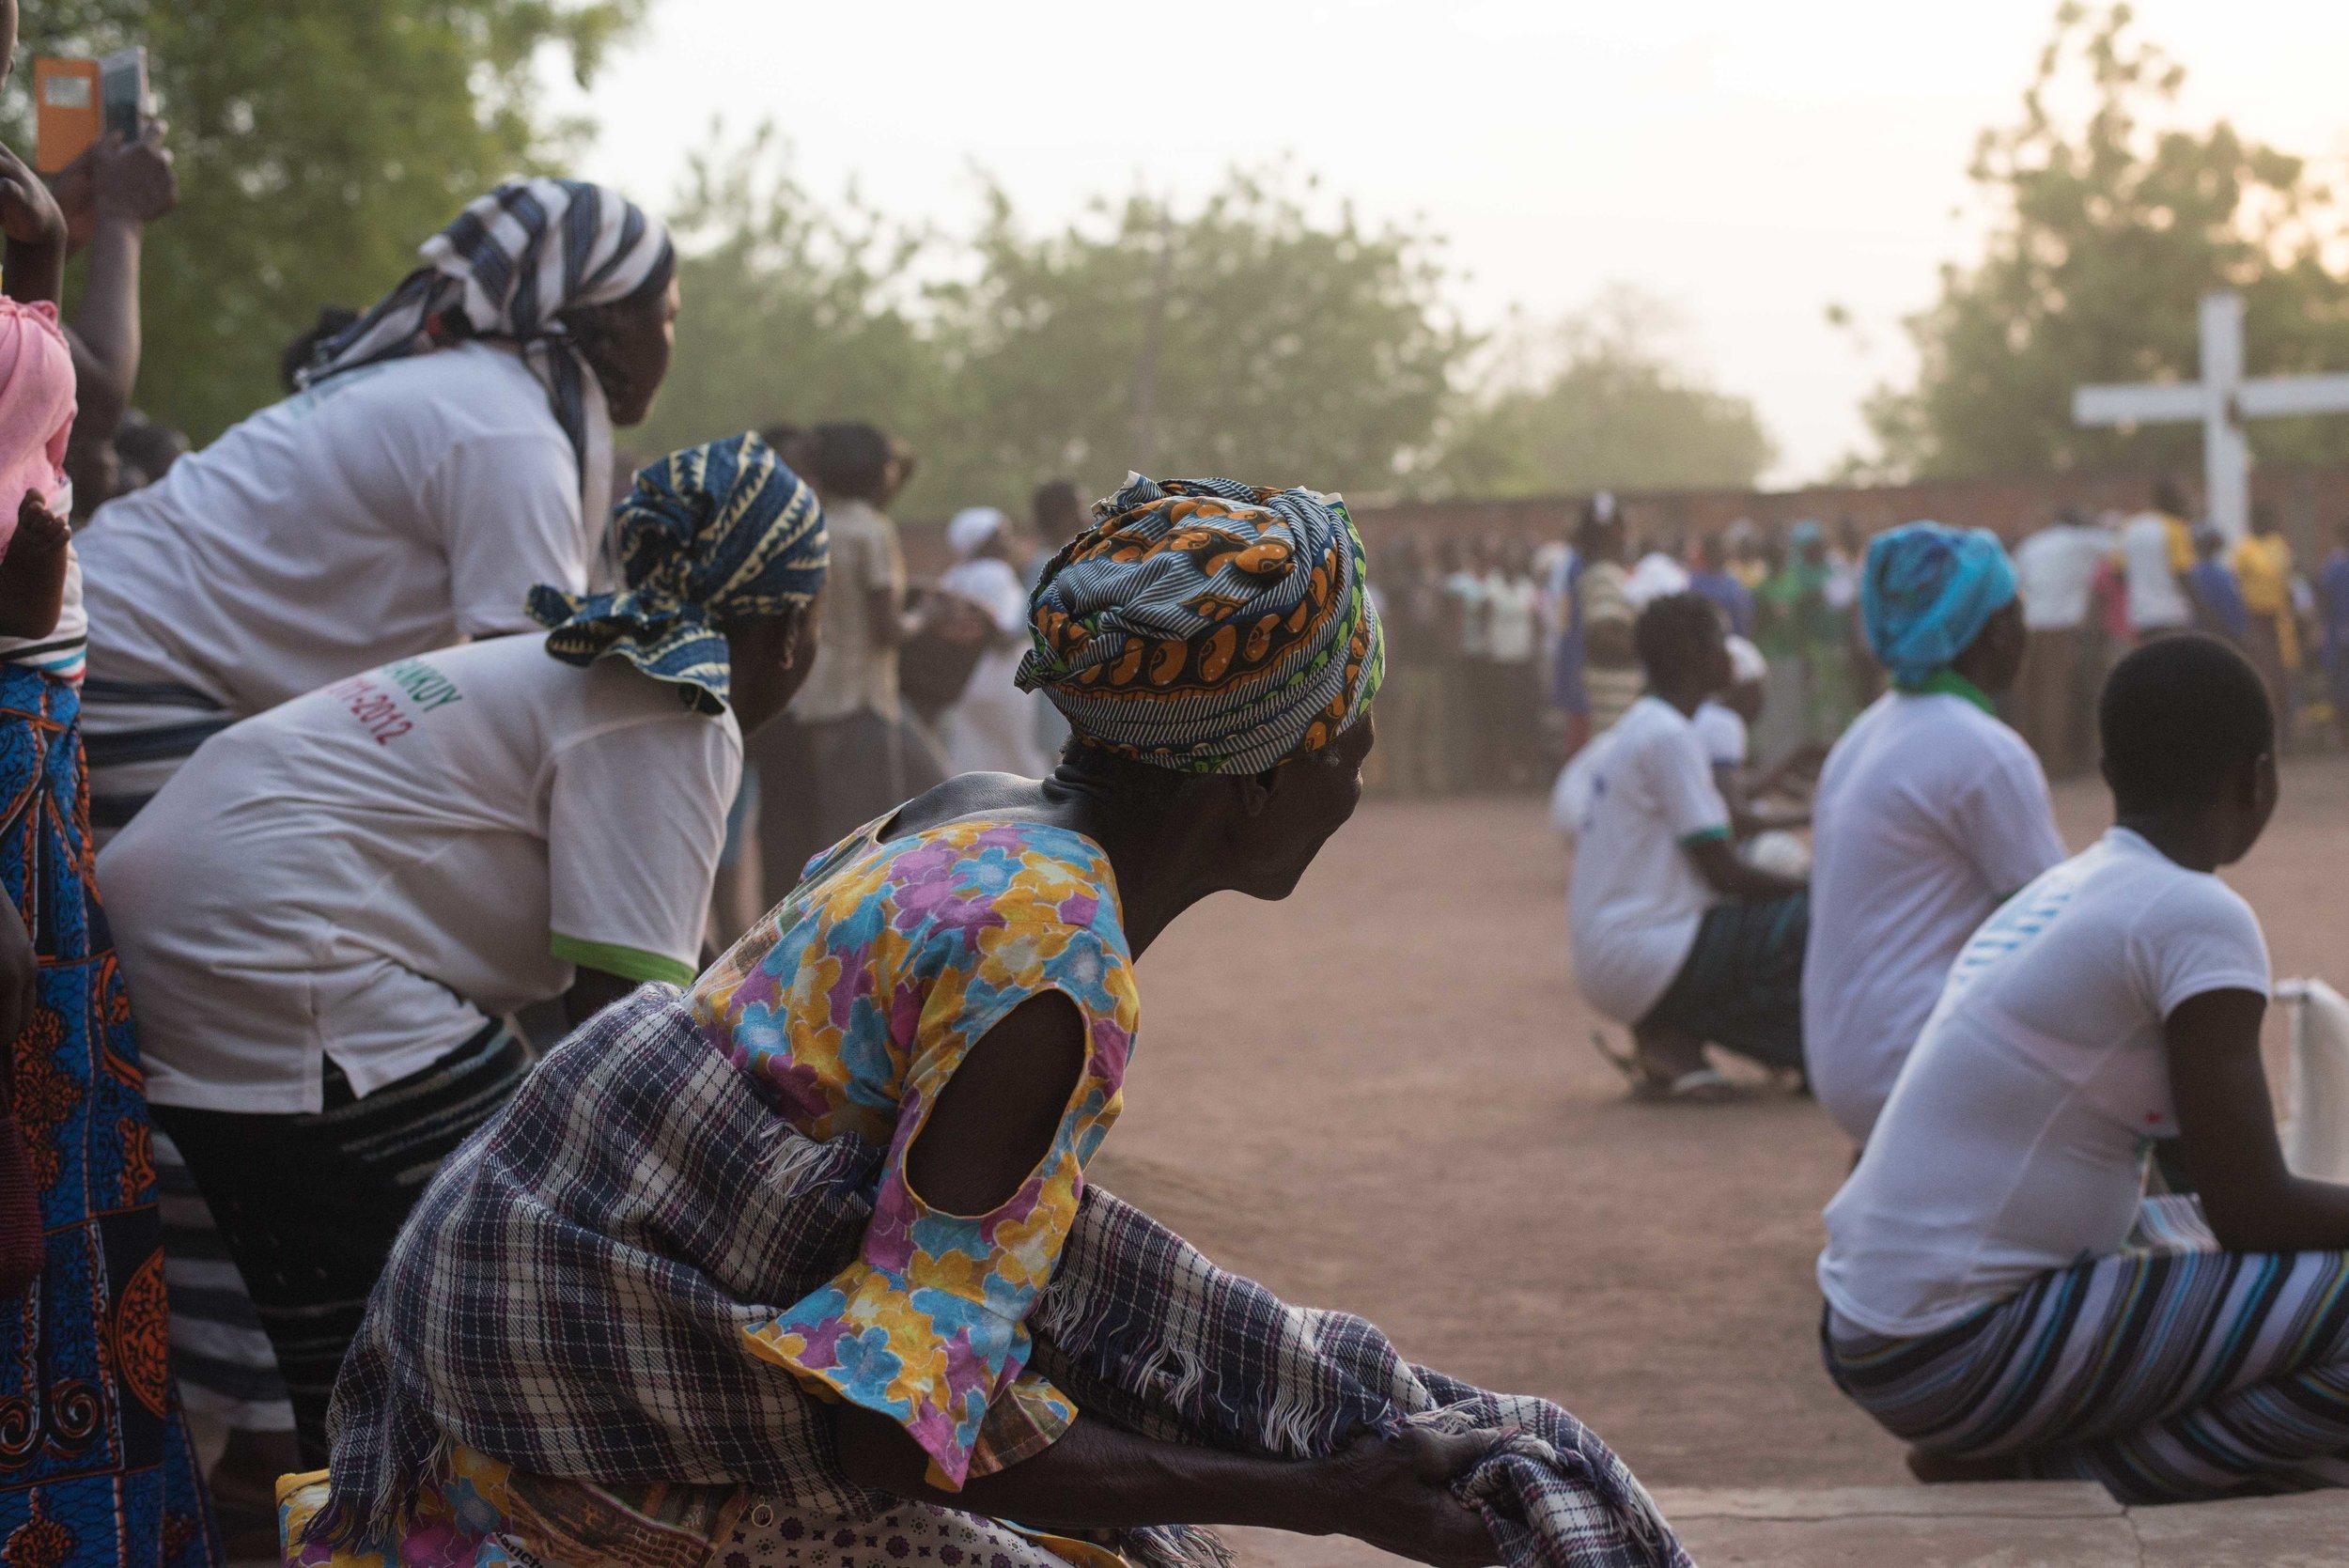 Solenzo, Burkina Faso, 2016